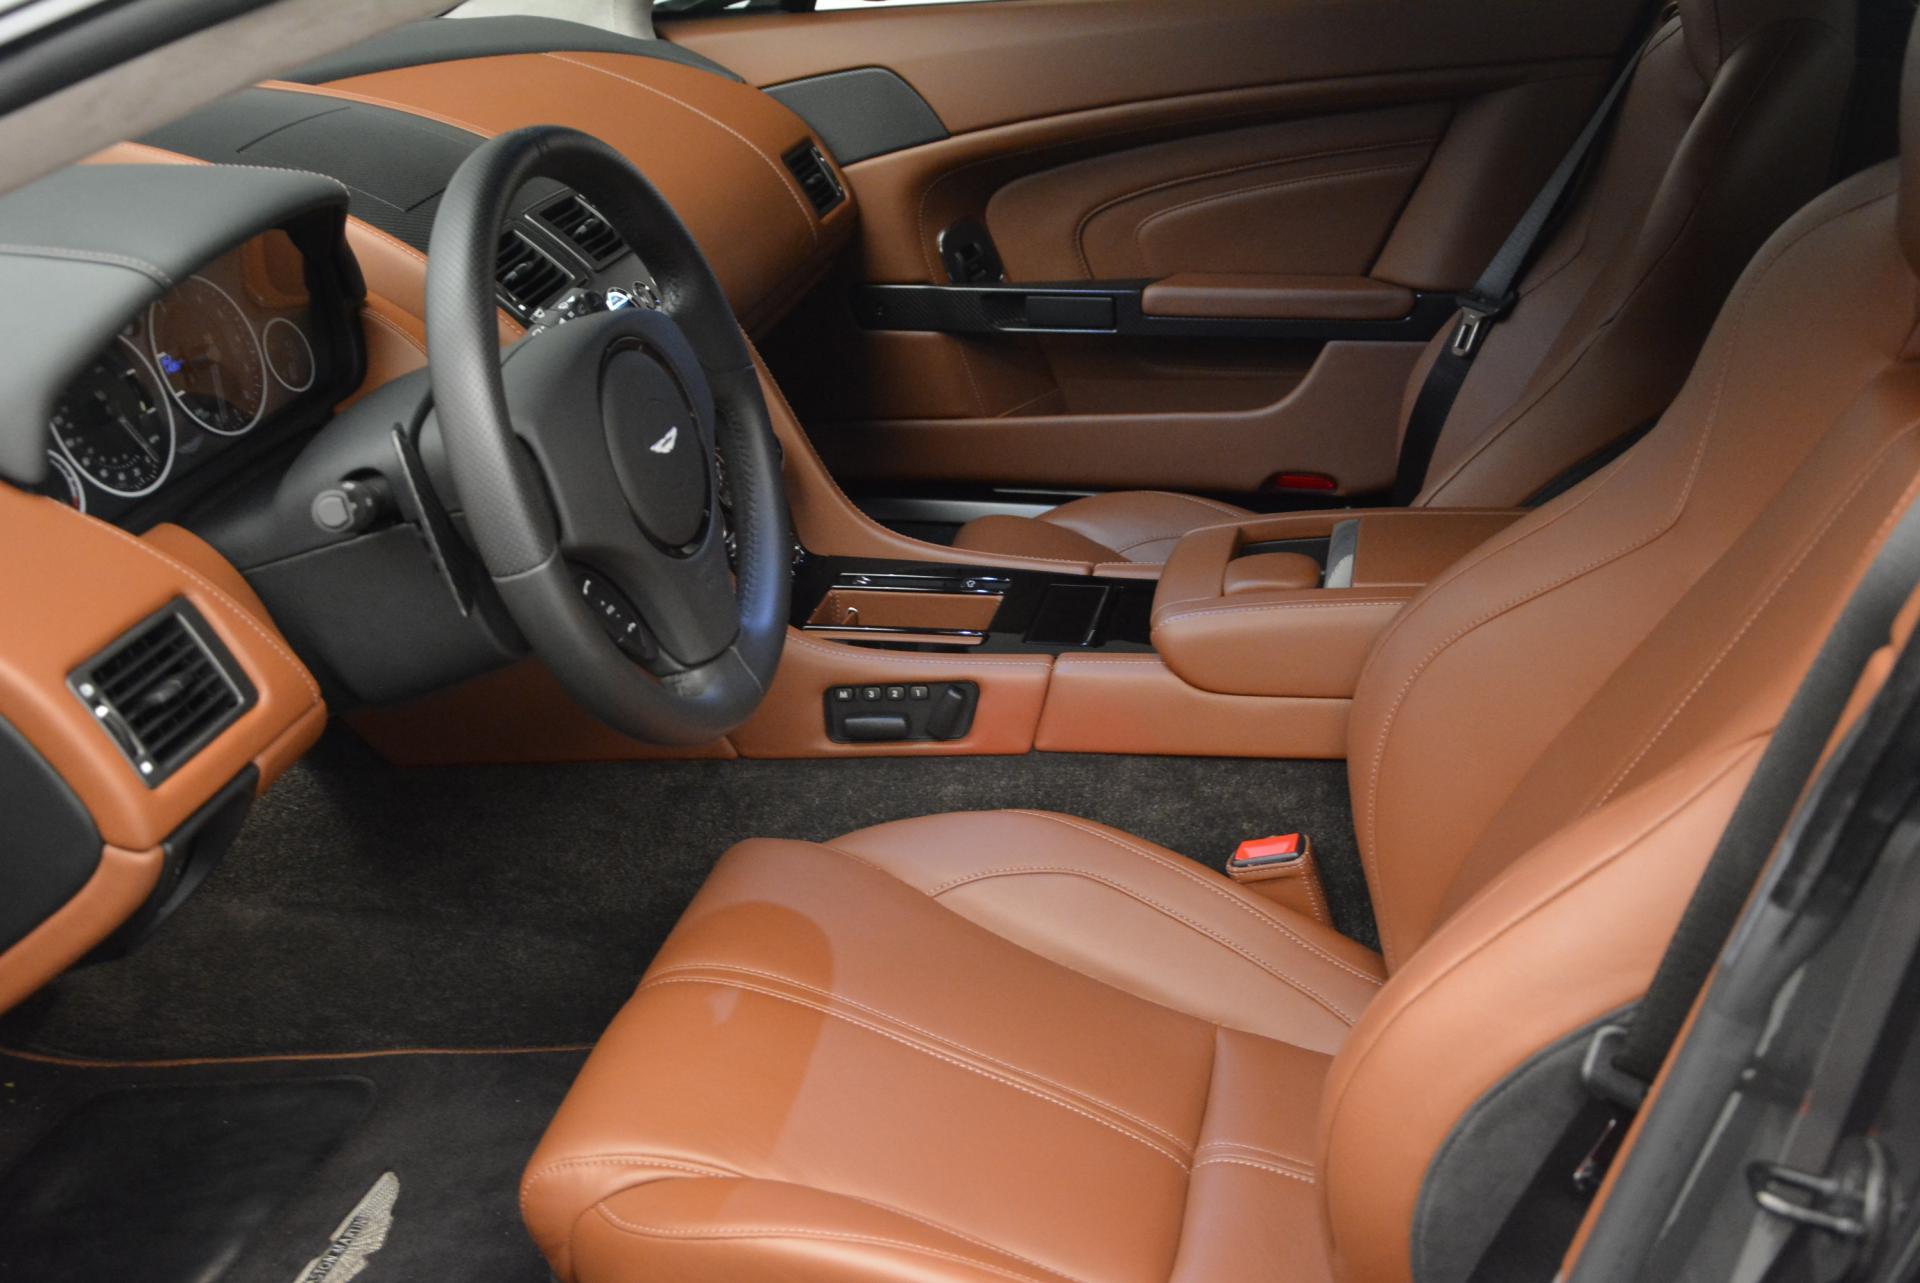 Used 2015 Aston Martin V12 Vantage S  For Sale In Greenwich, CT. Alfa Romeo of Greenwich, 7003 101_p14